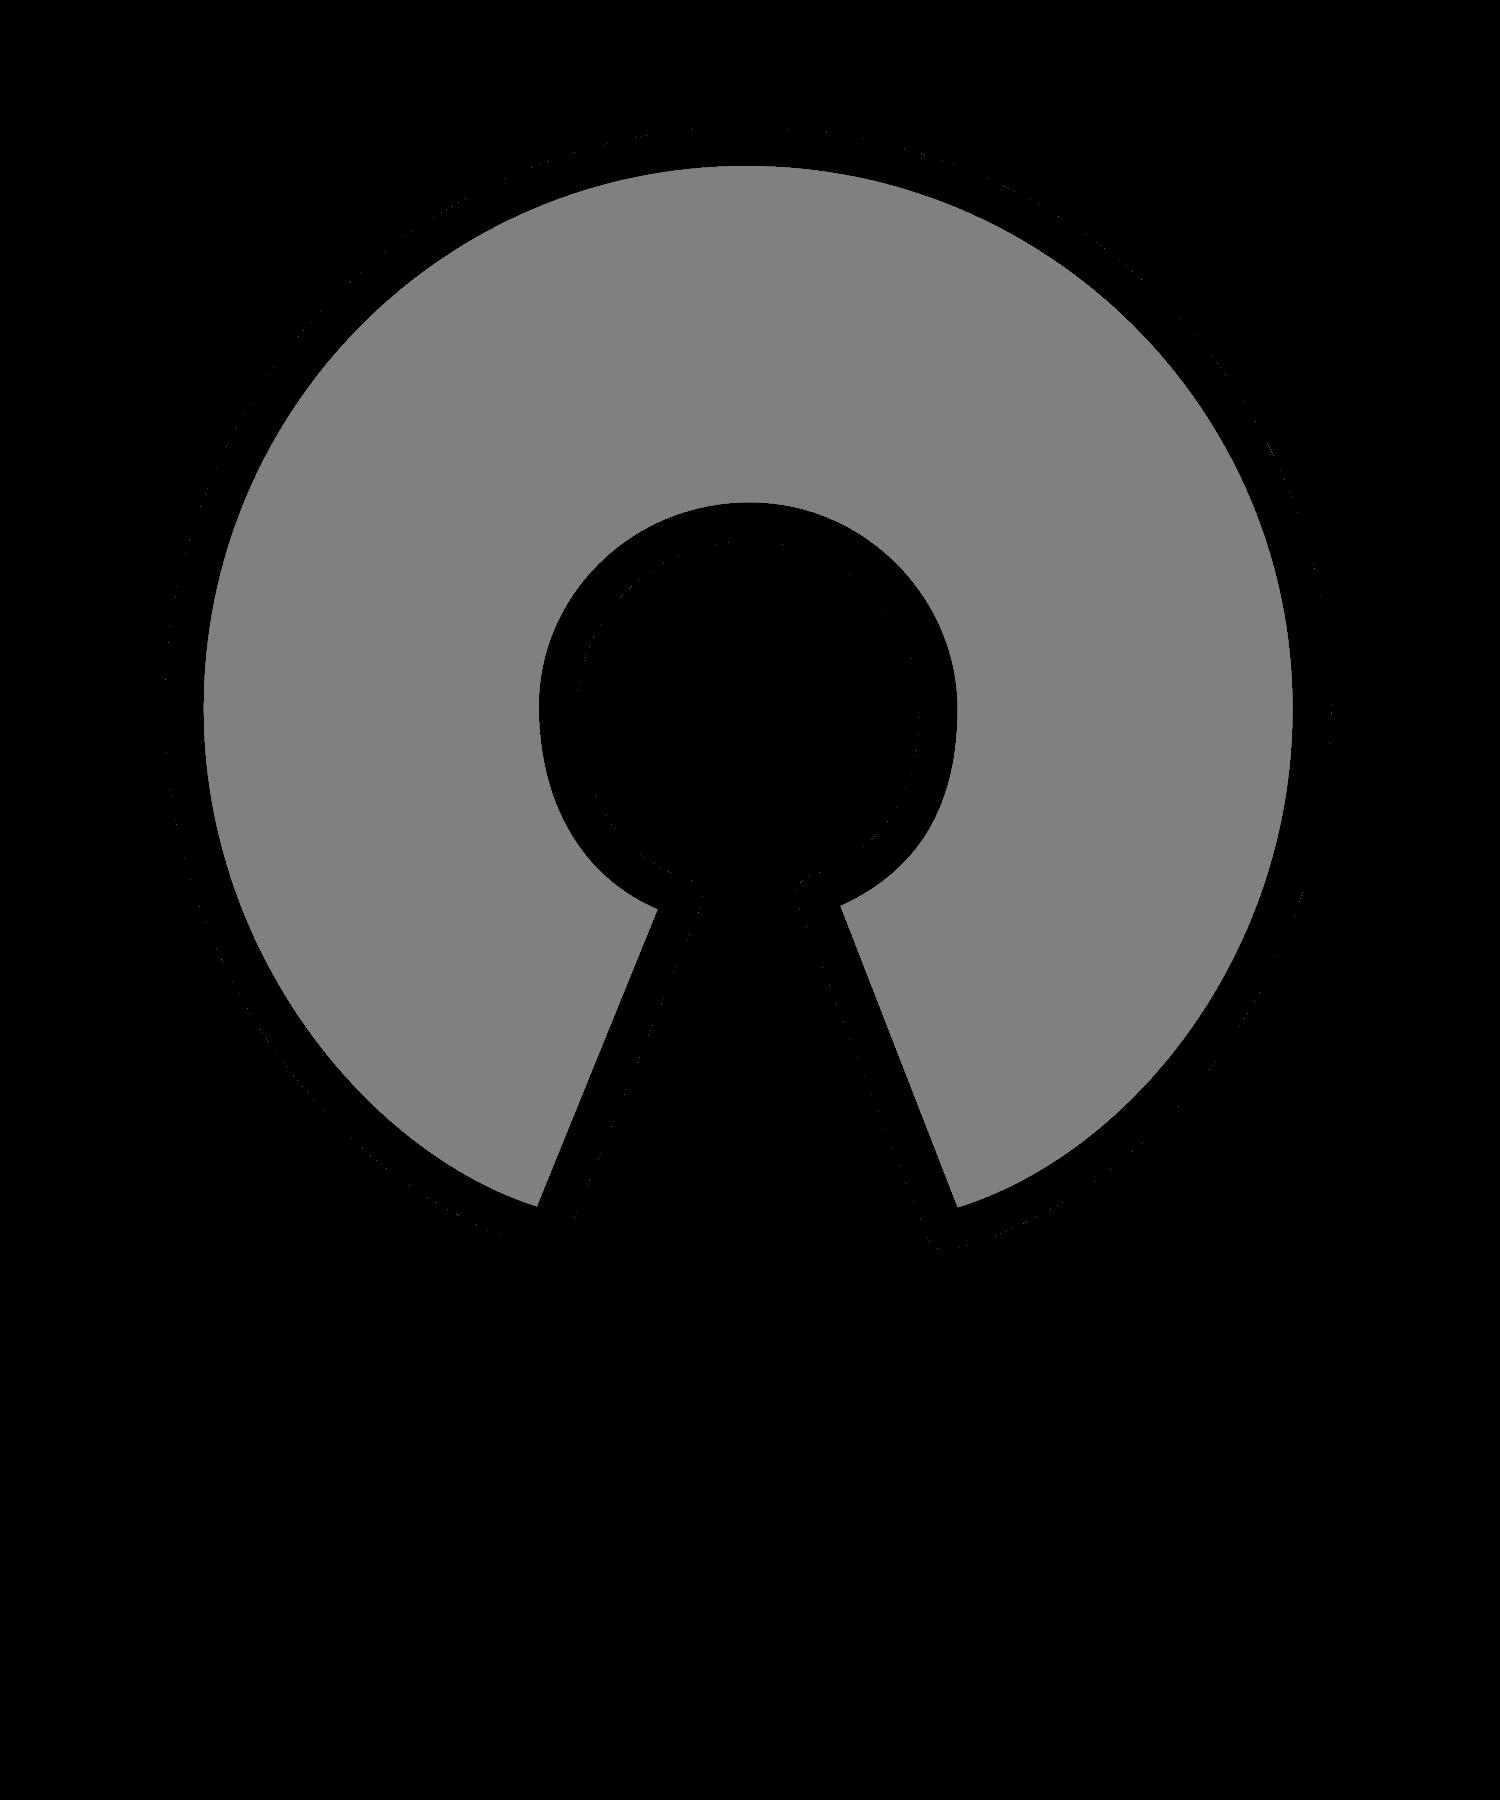 Logo Usage Guidelines.